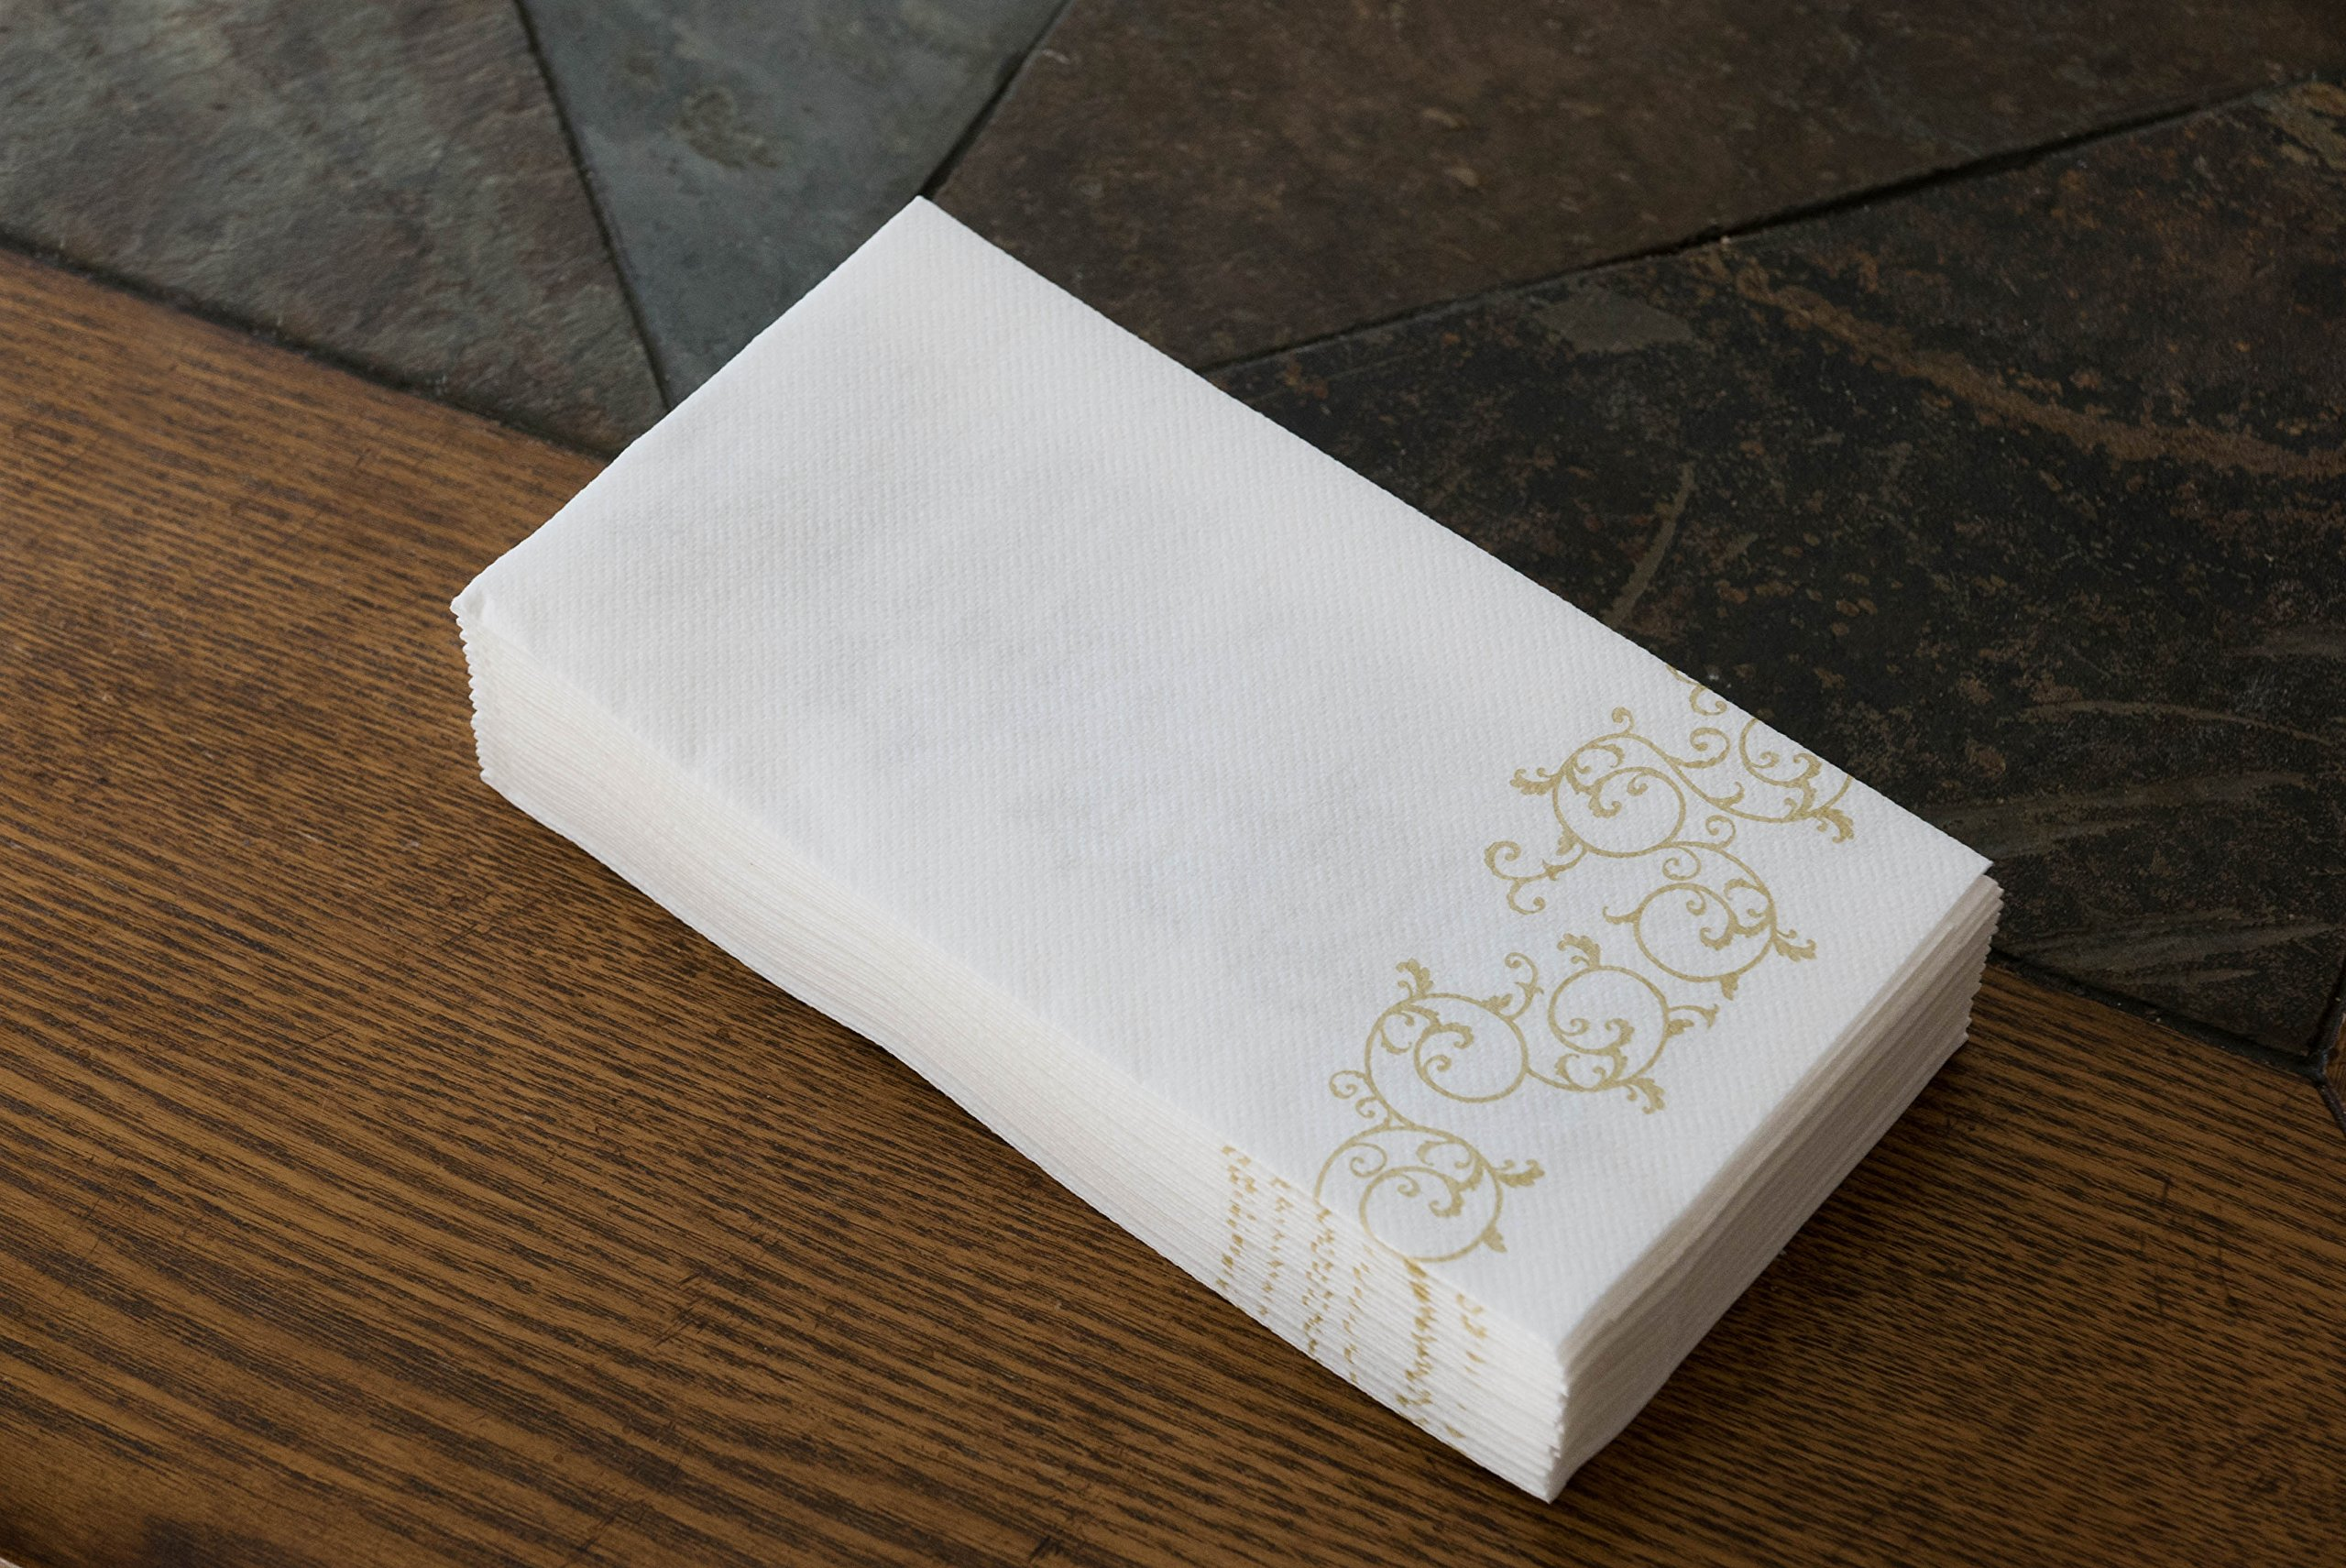 Galleon simulinen decorative linen feel bathroom hand - Decorative hand towels for bathroom ...